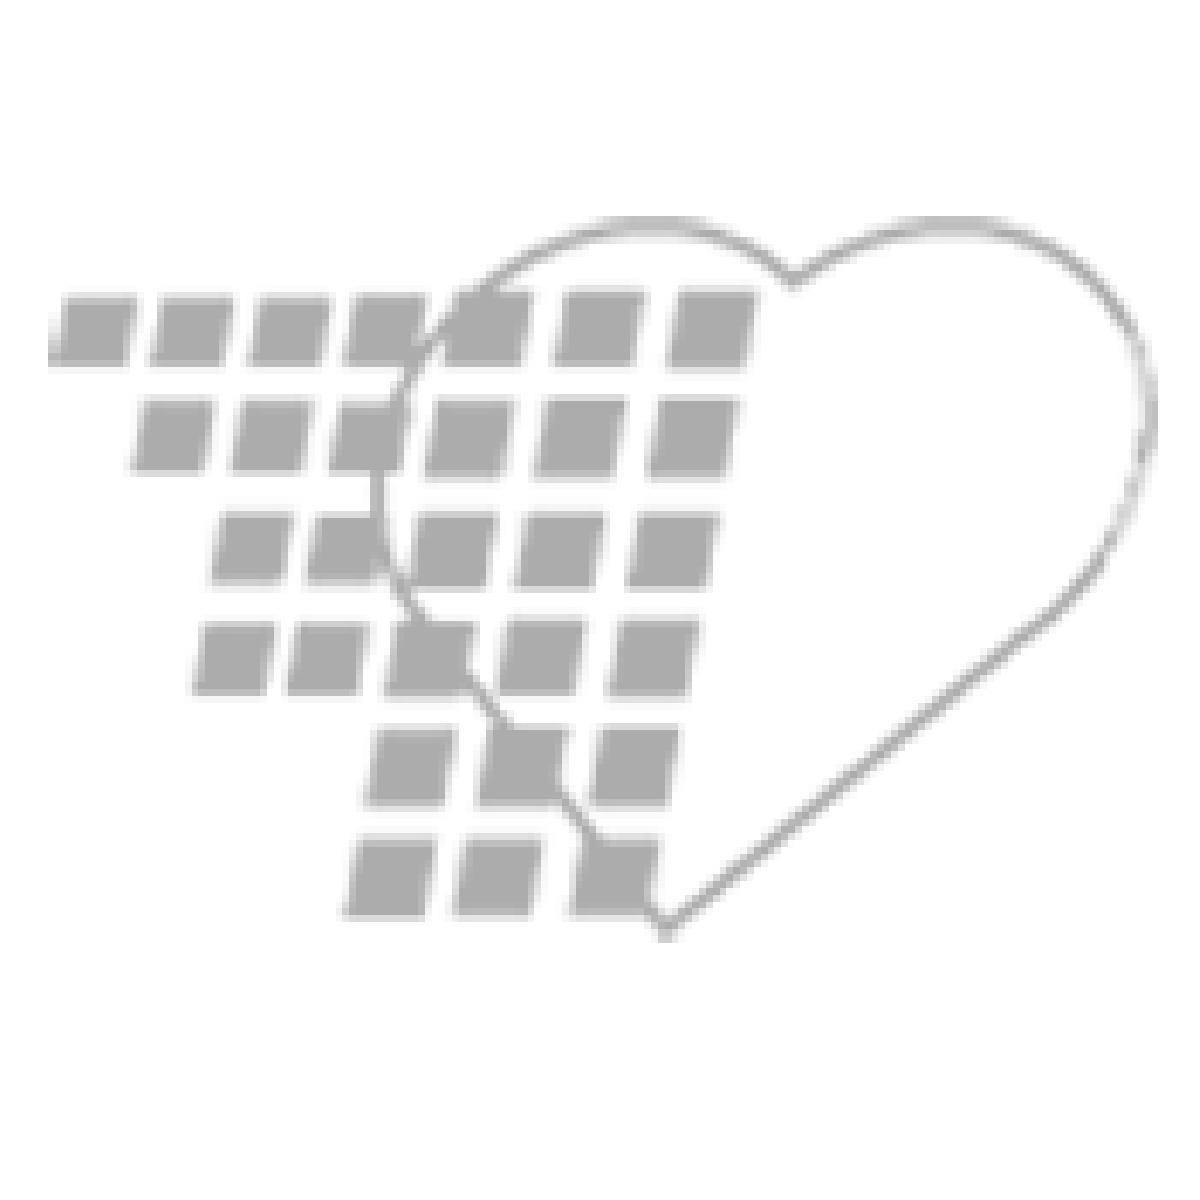 06-93-1425 Demo Dose® Clindamycn 300mg/ vial 2mL